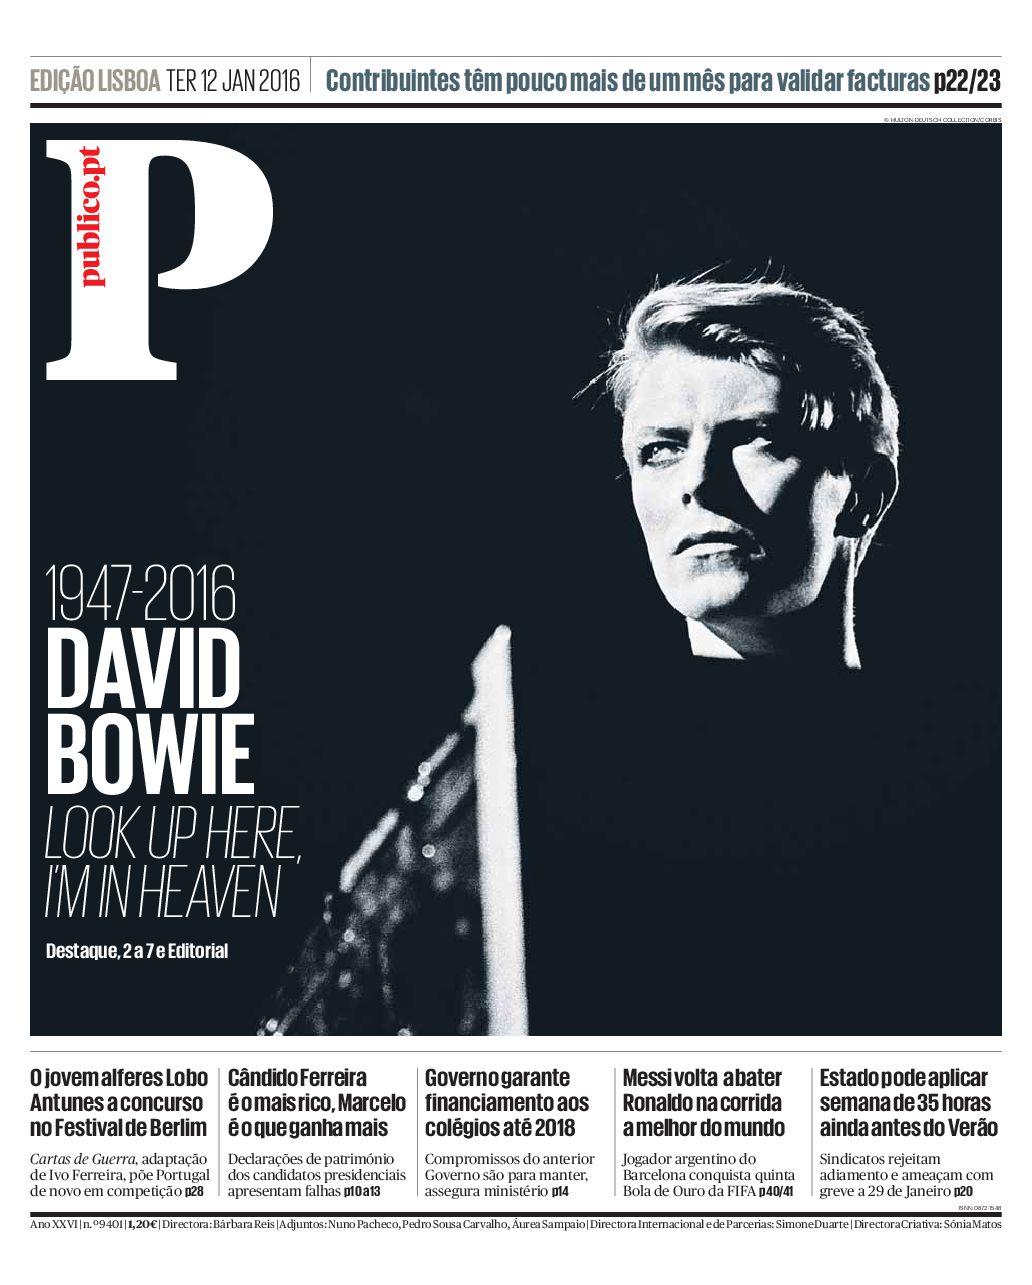 David Bowie na capa do PÚBLICO